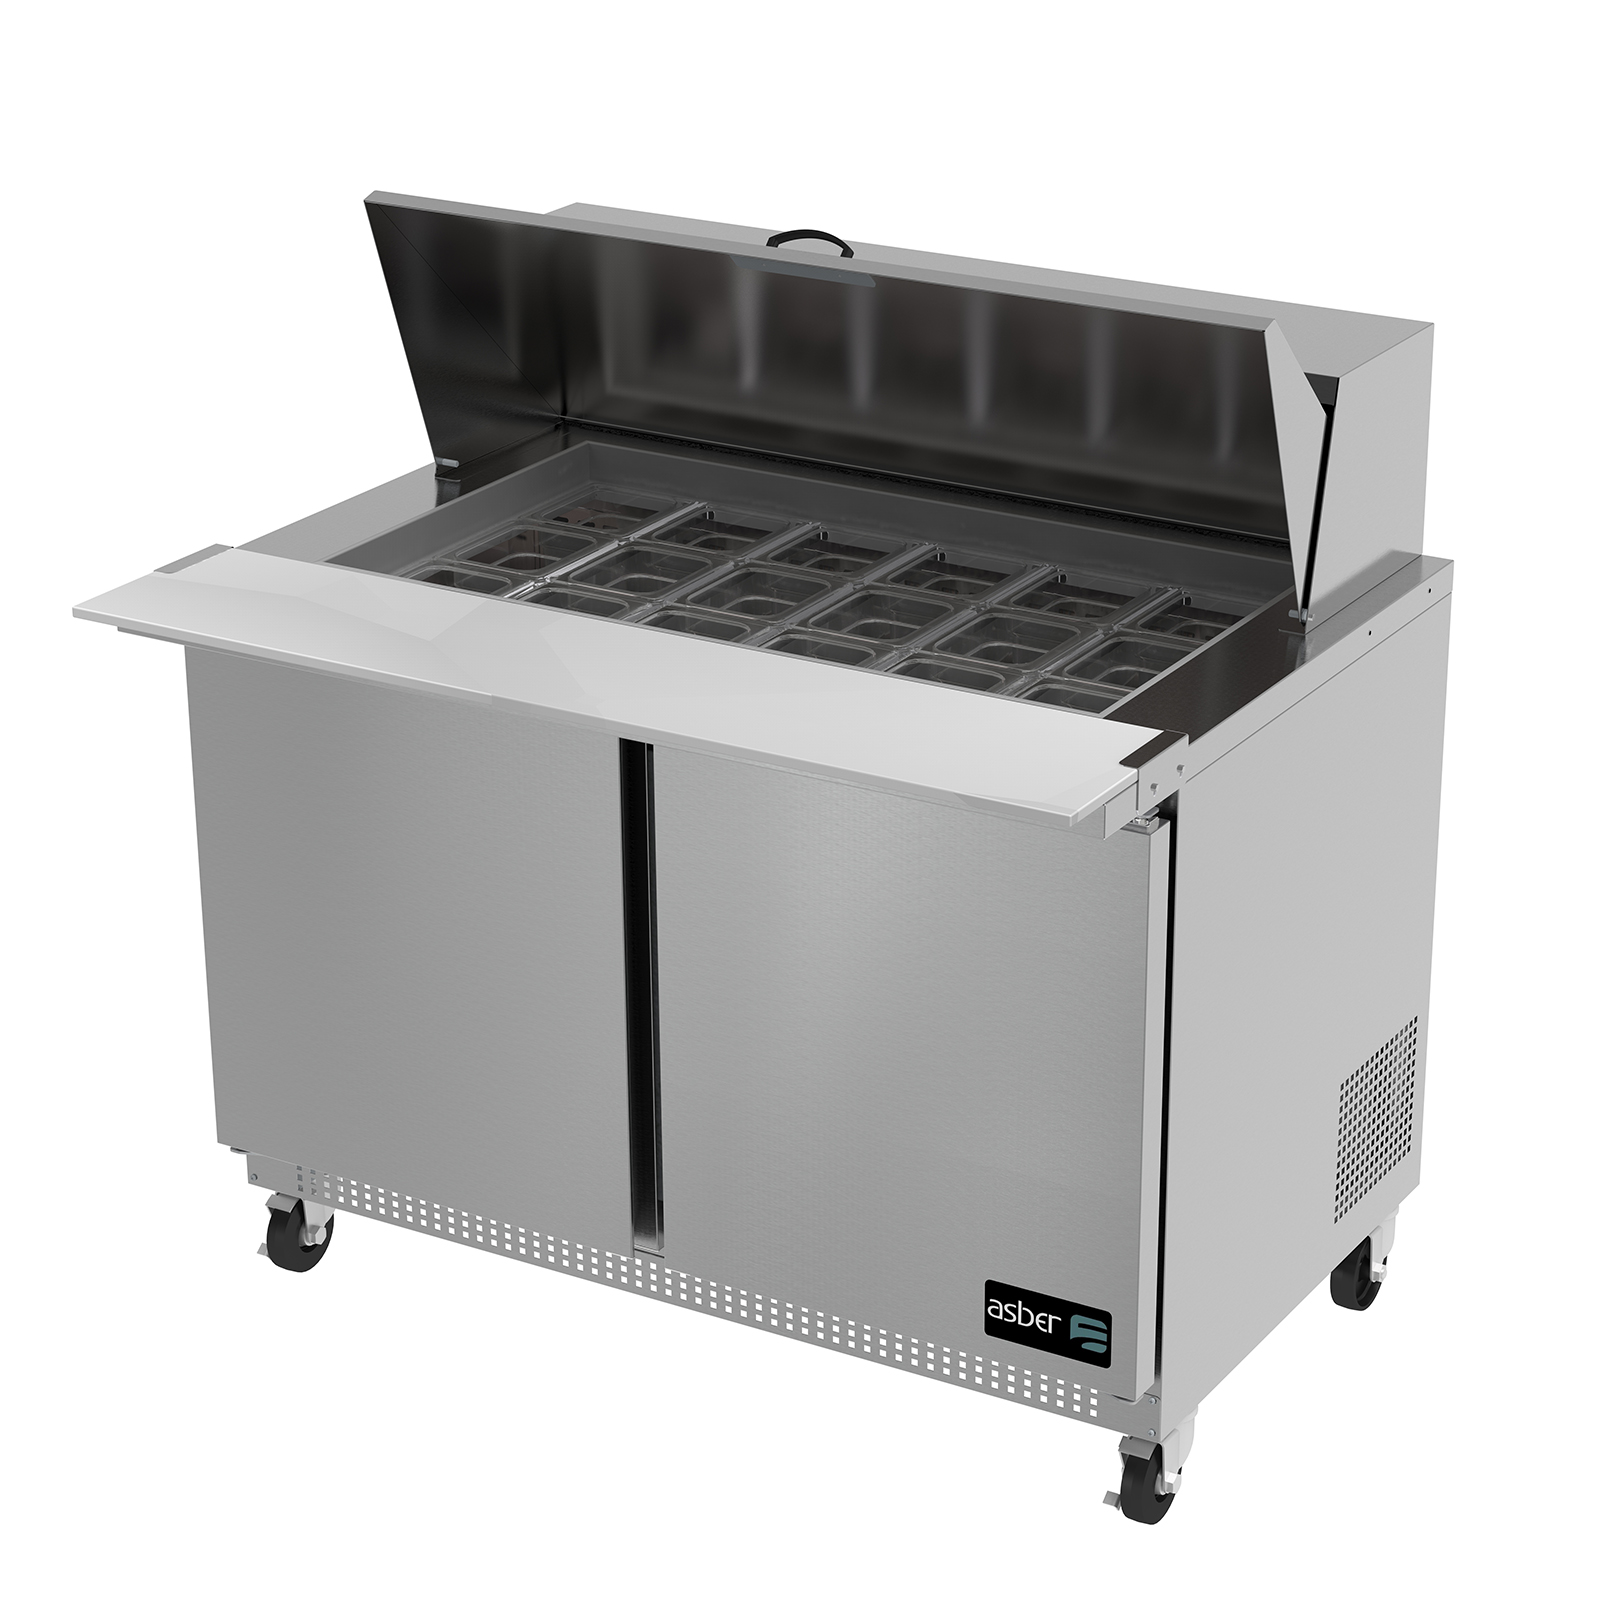 APTM-48-18 Asber refrigerated counter, mega top sandwich / salad unit